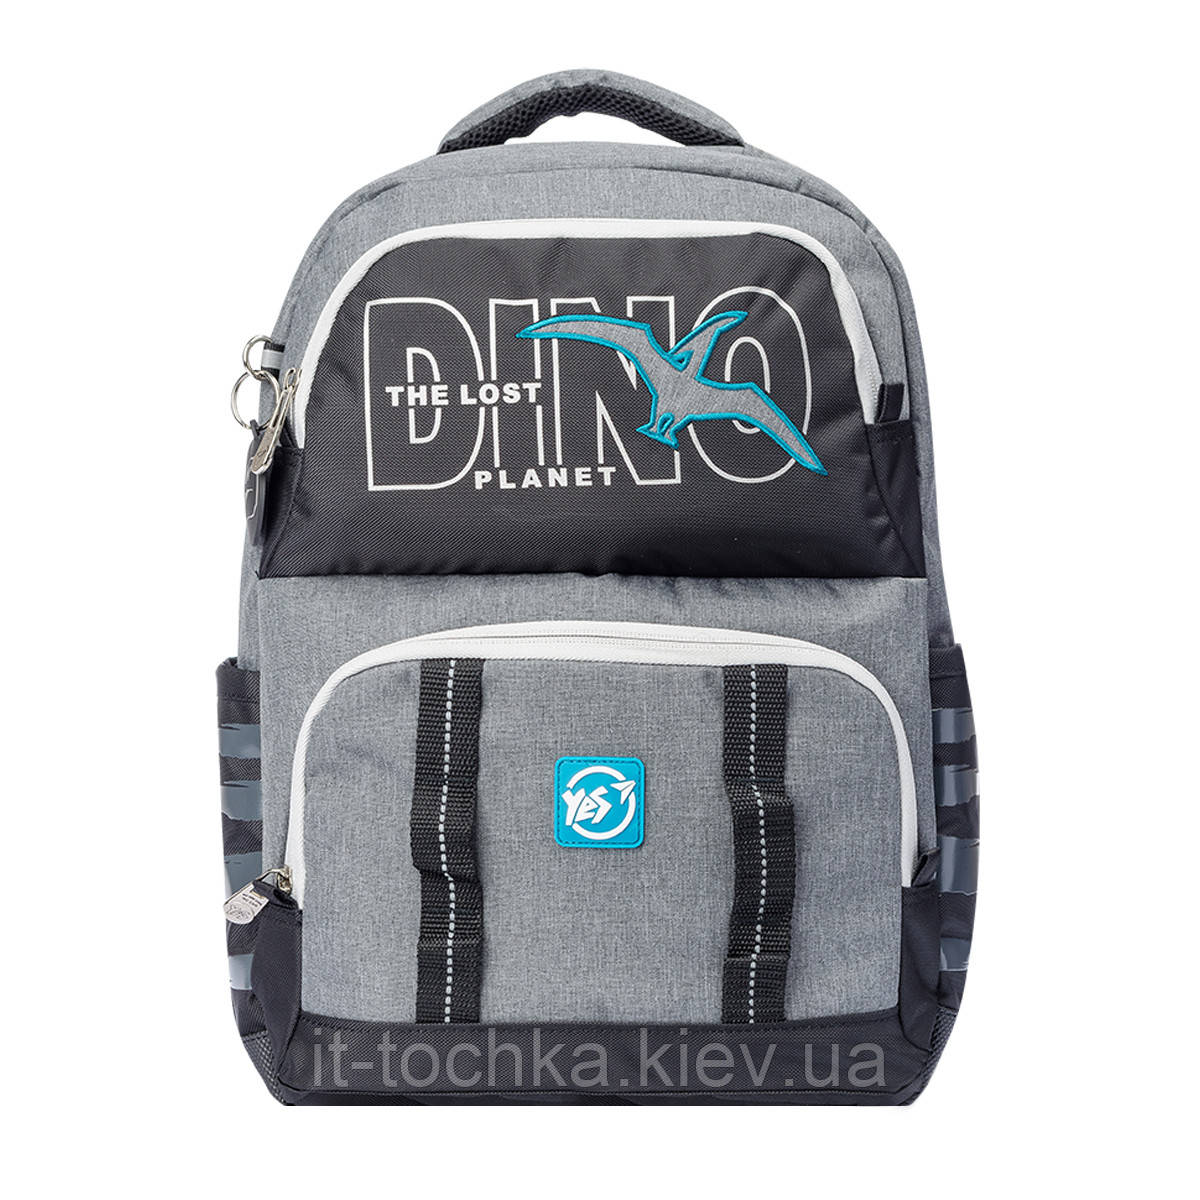 Рюкзак школьный yes s-30 juno x  dino yes 558143